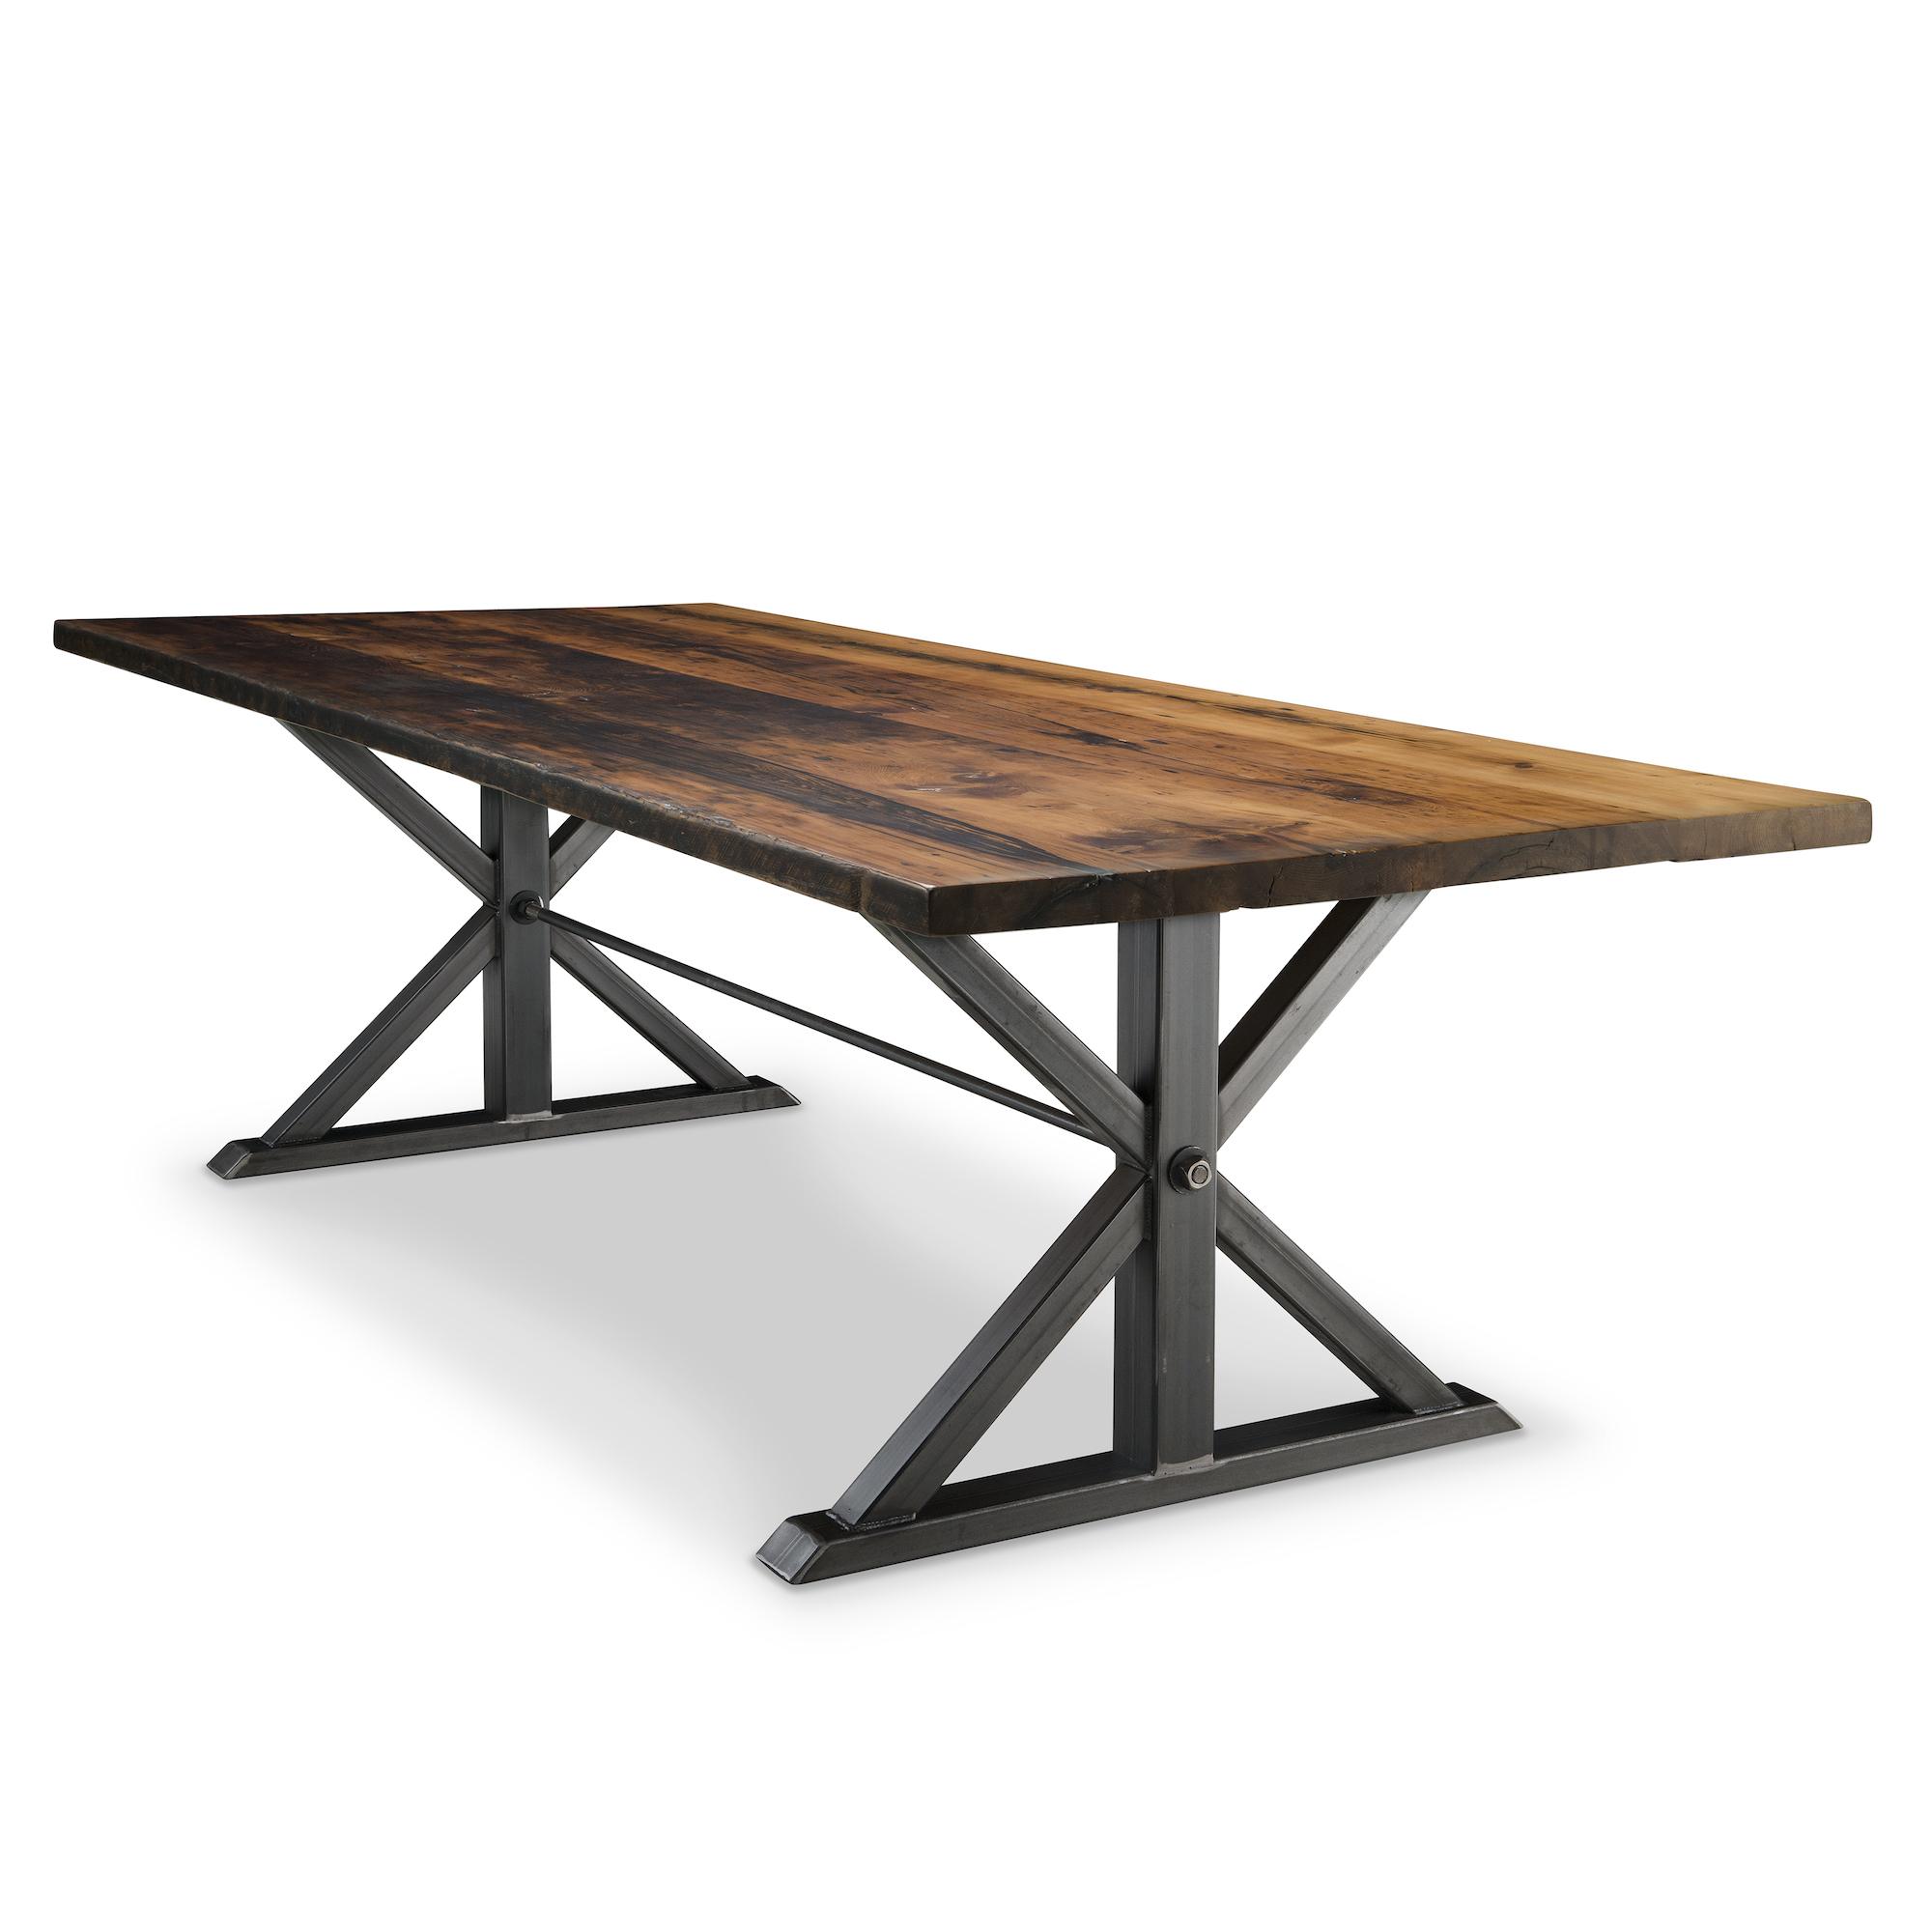 Jackson_Double_Ped_Table_Angled-2-1-1.jpg